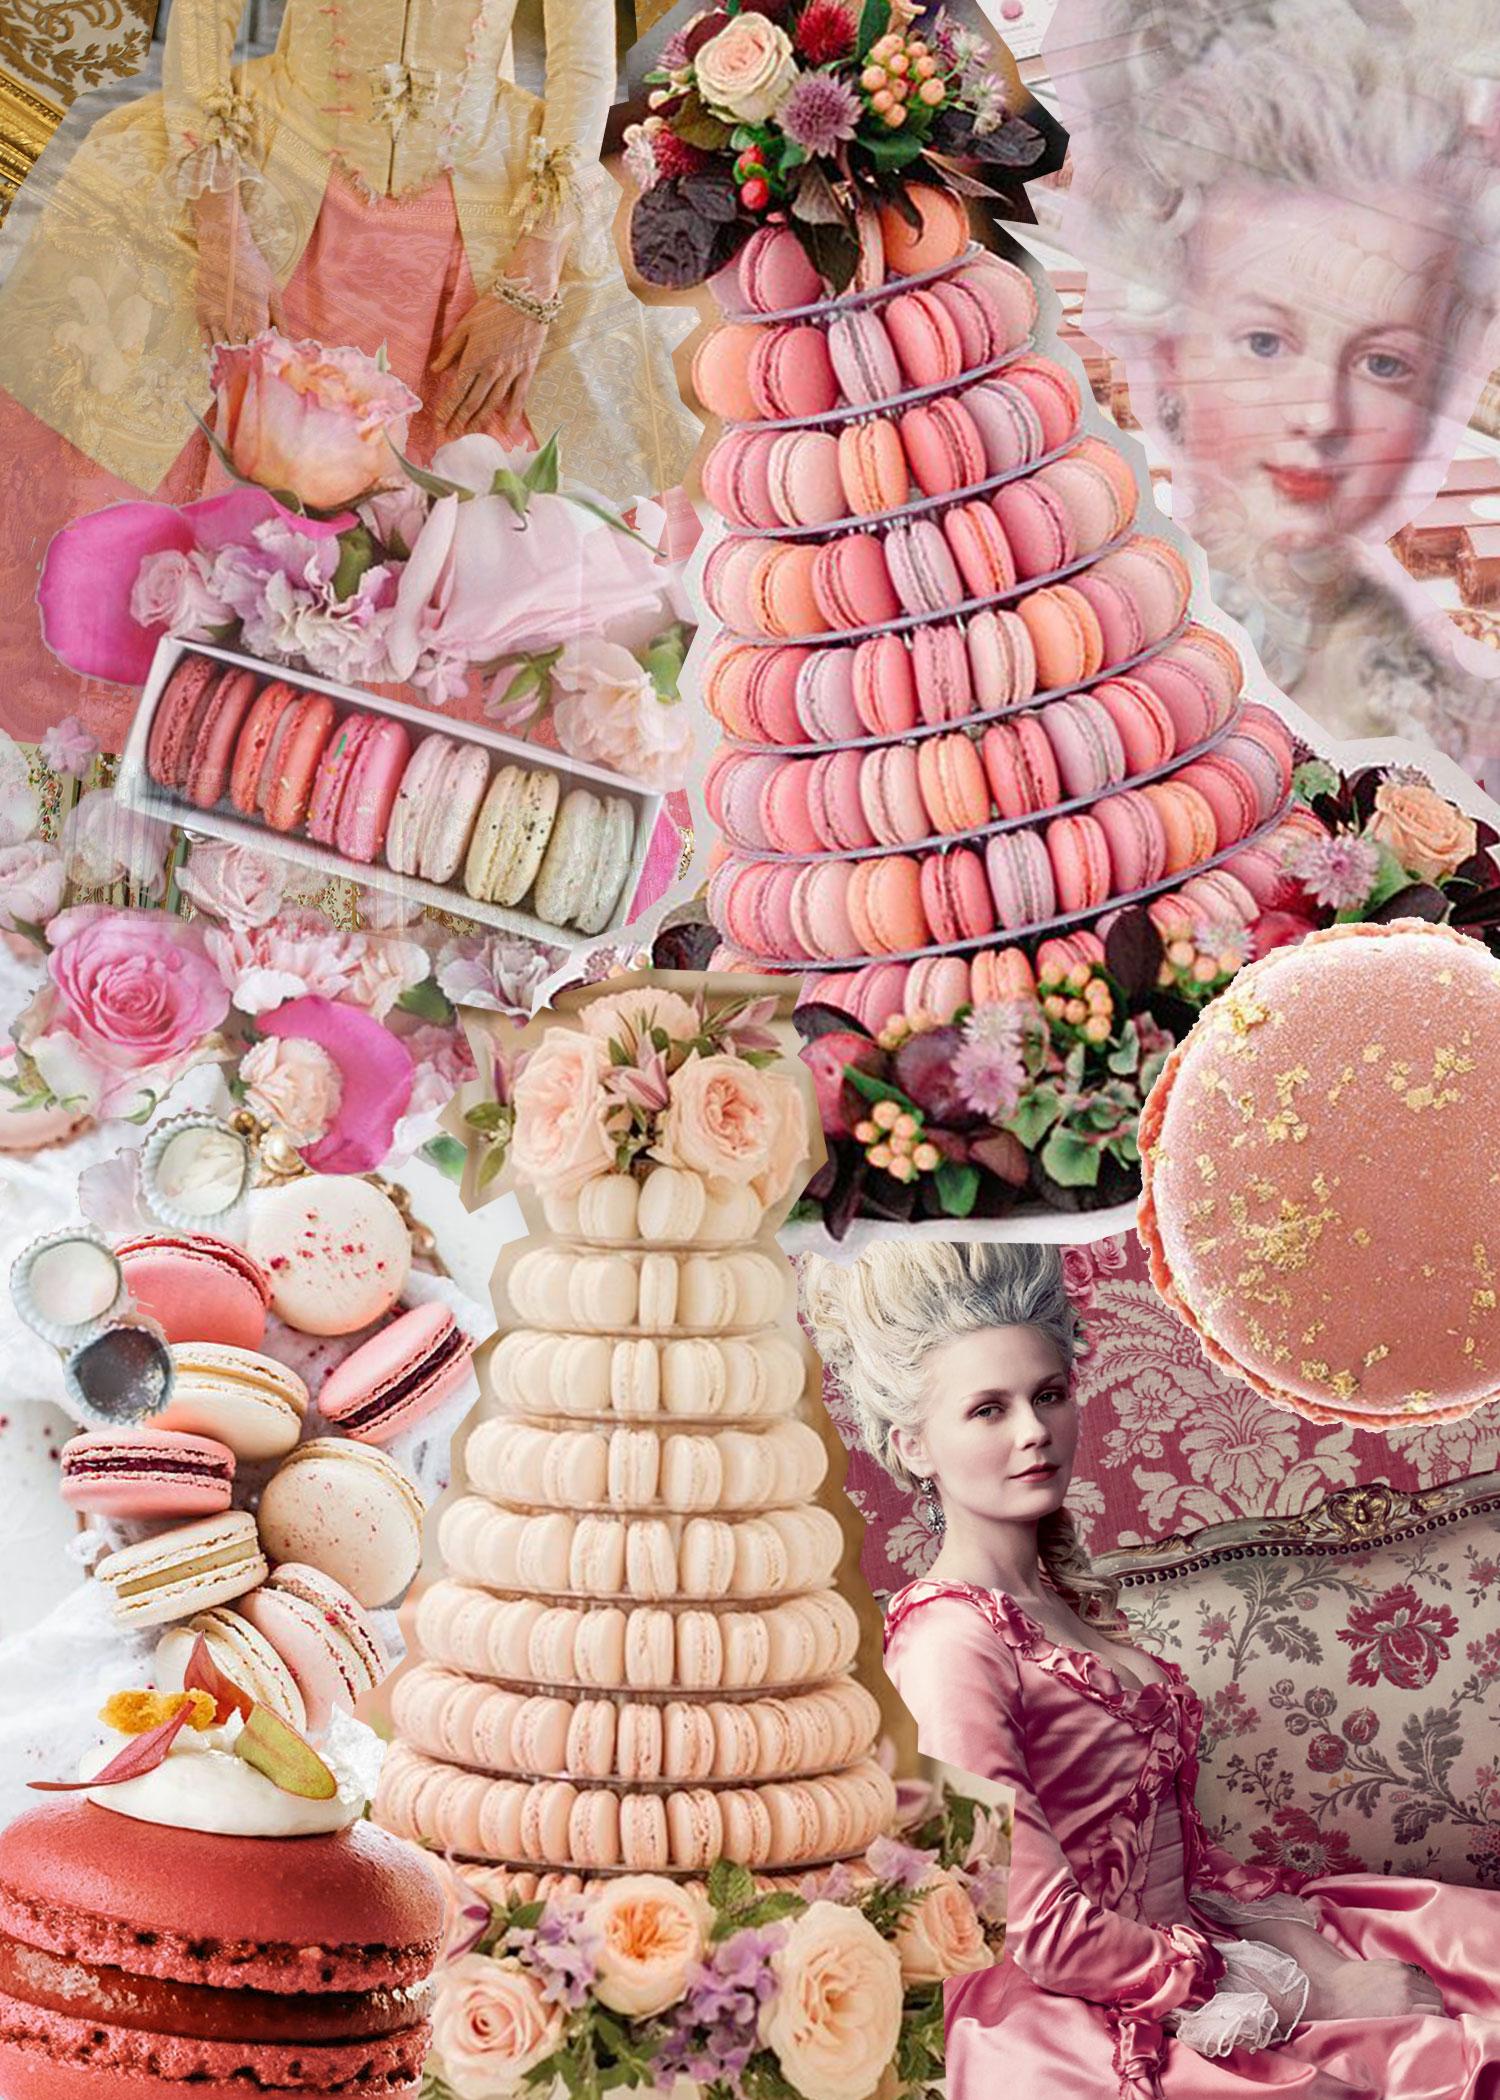 Macaron-Collage.jpg